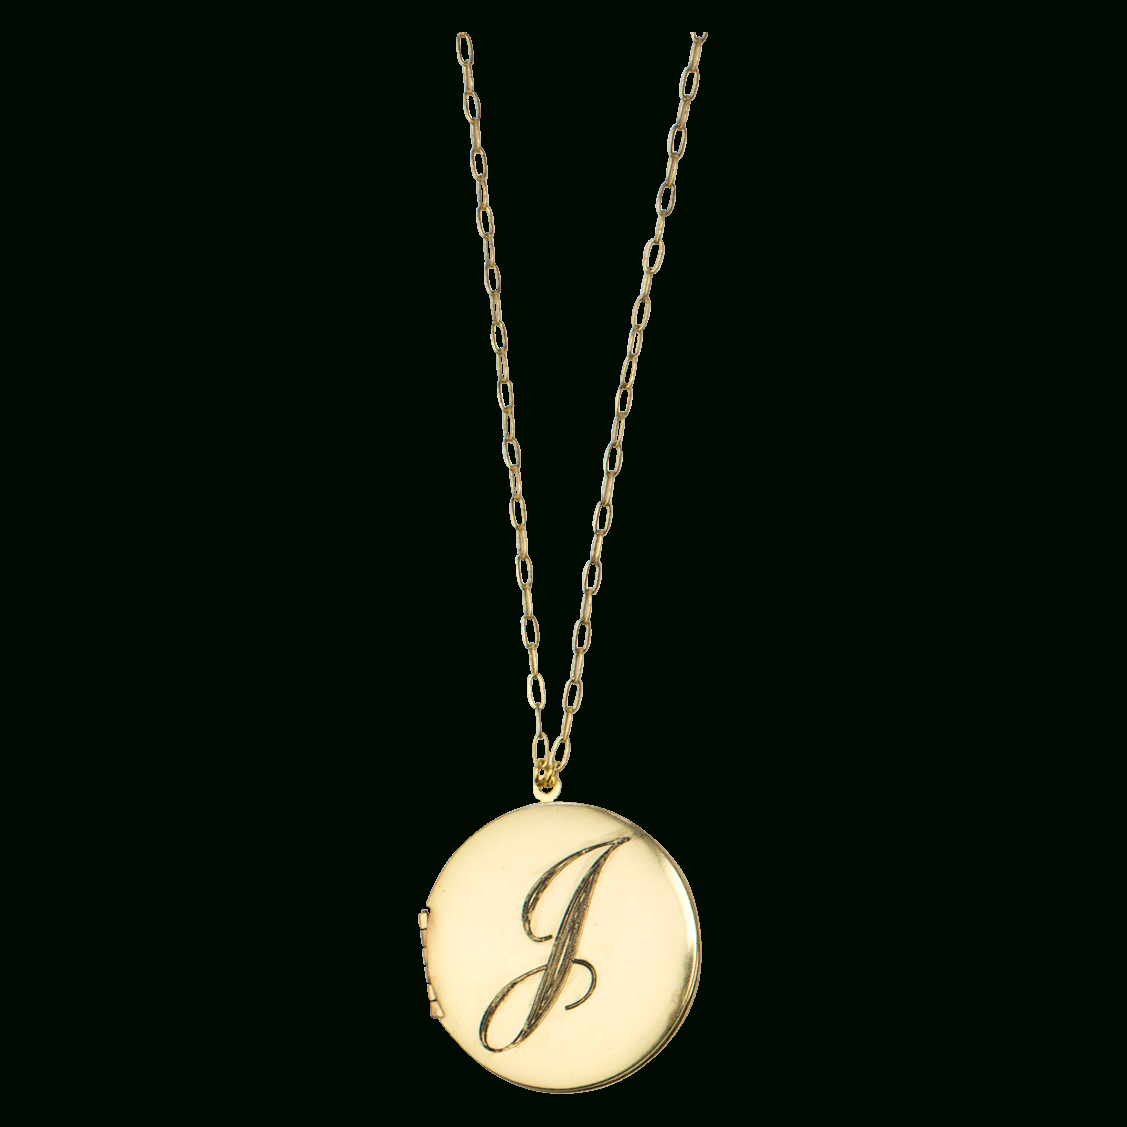 John Wind Monogram Locket Pendant With Regard To Latest Sparkling Daisy Flower Locket Element Necklaces (View 7 of 25)